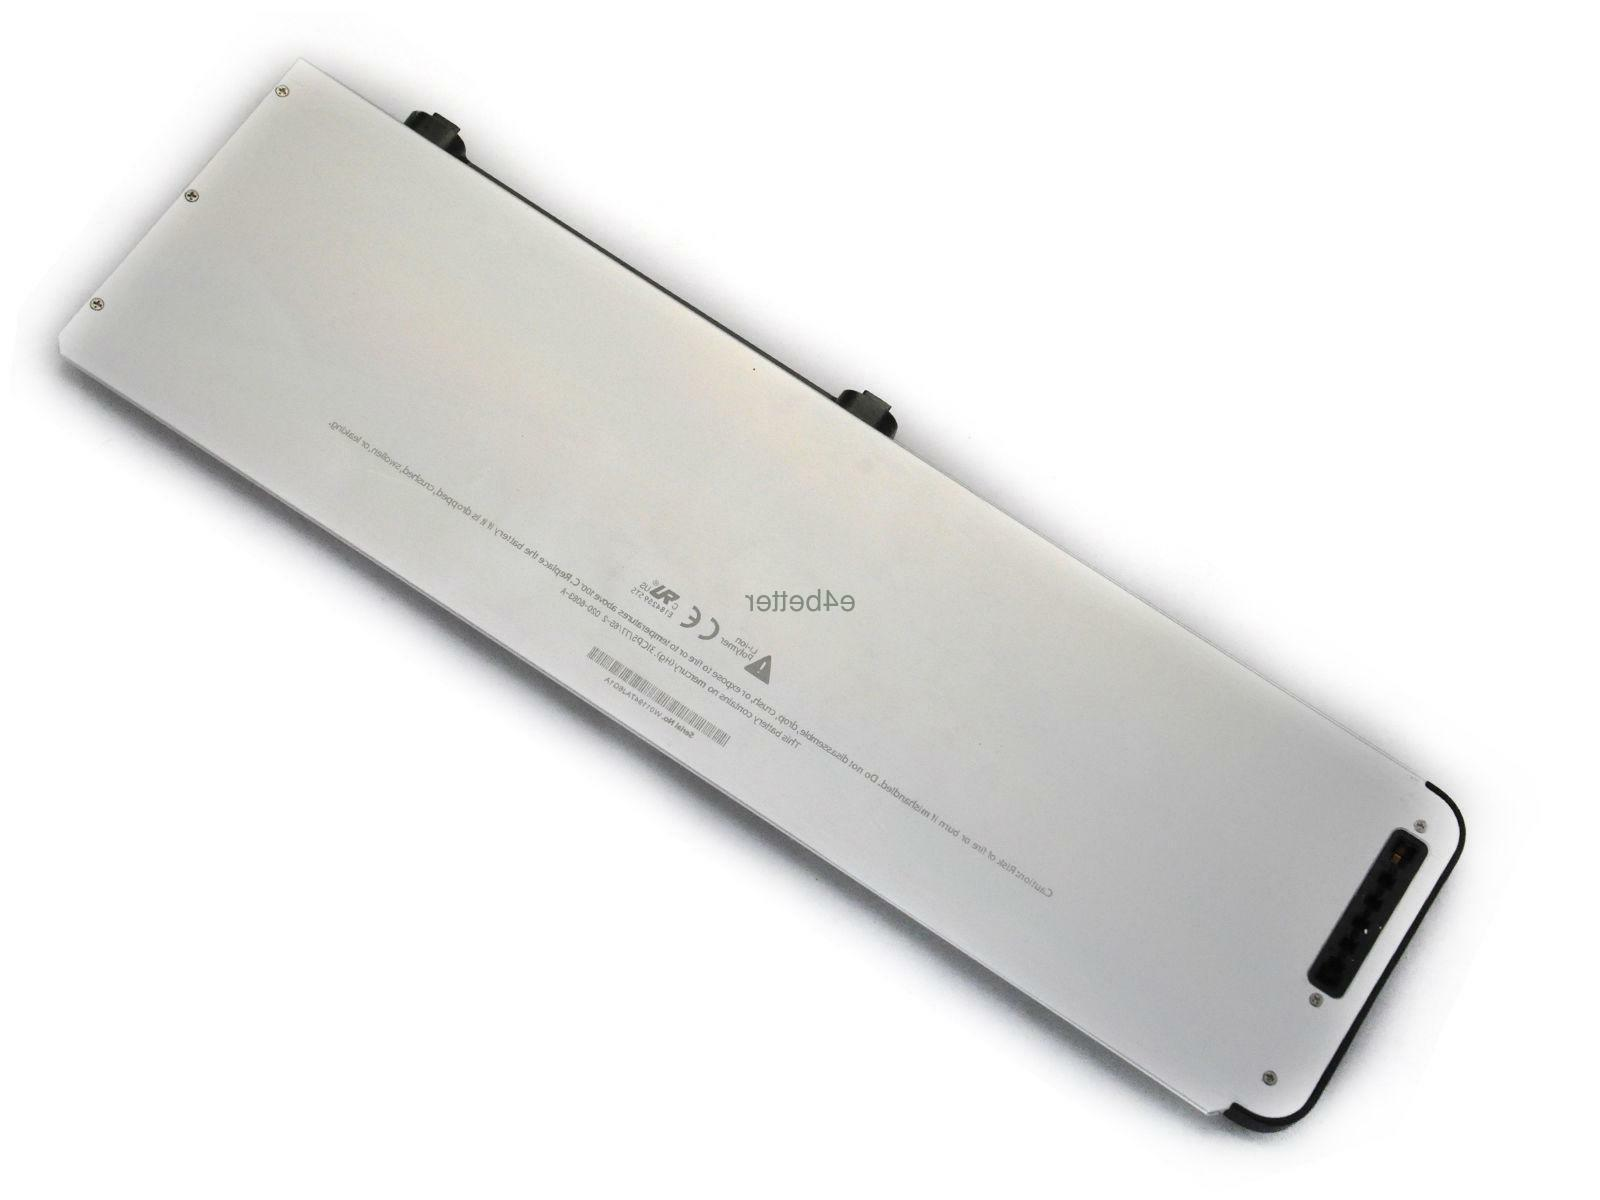 50Wh Apple MacBook Battery 661-4833